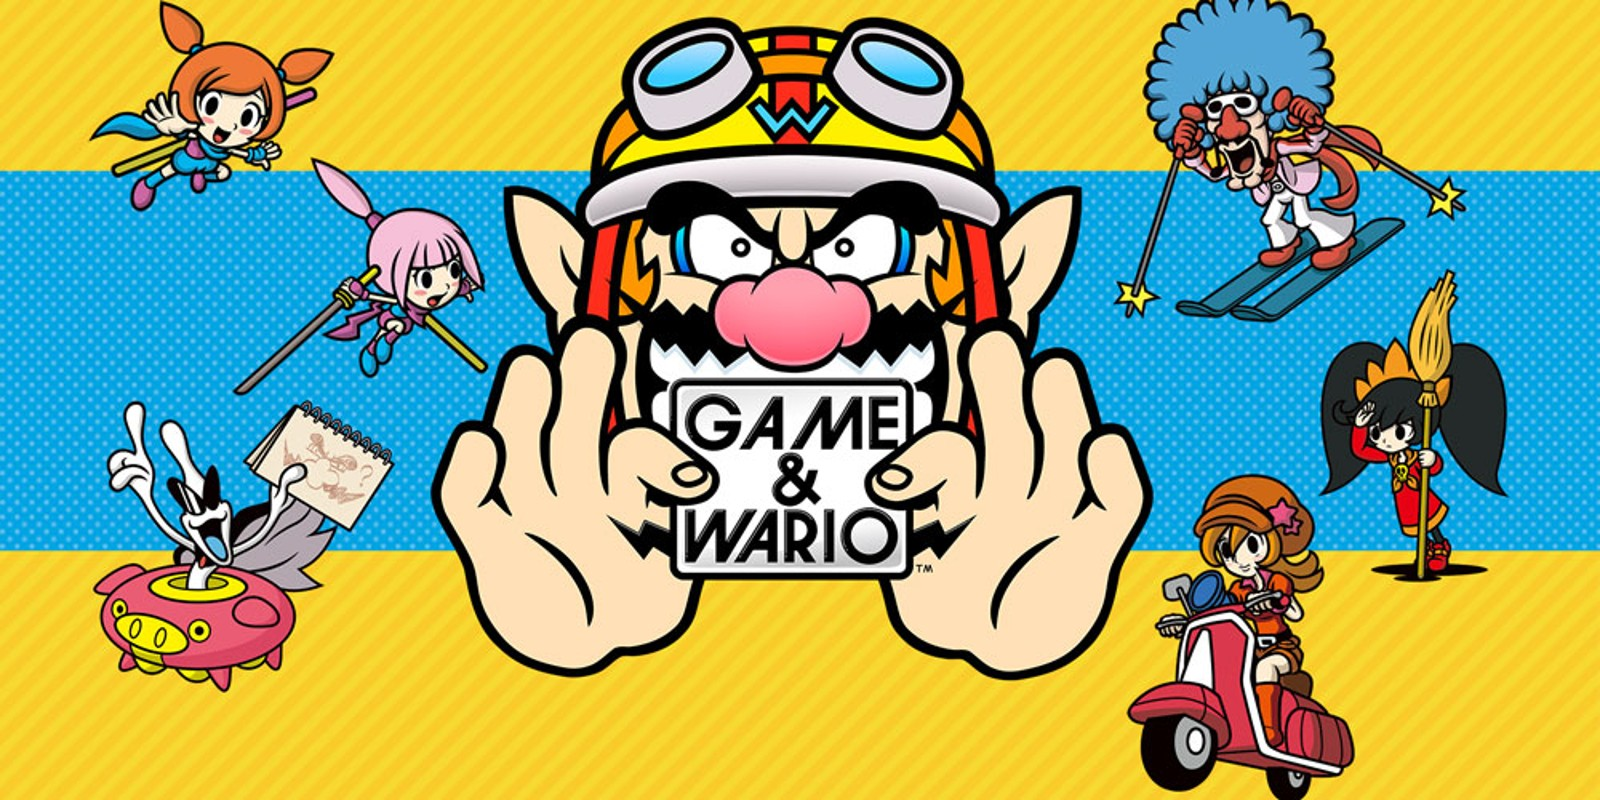 SI_WiiU_GameAndWario_image1600w.jpg